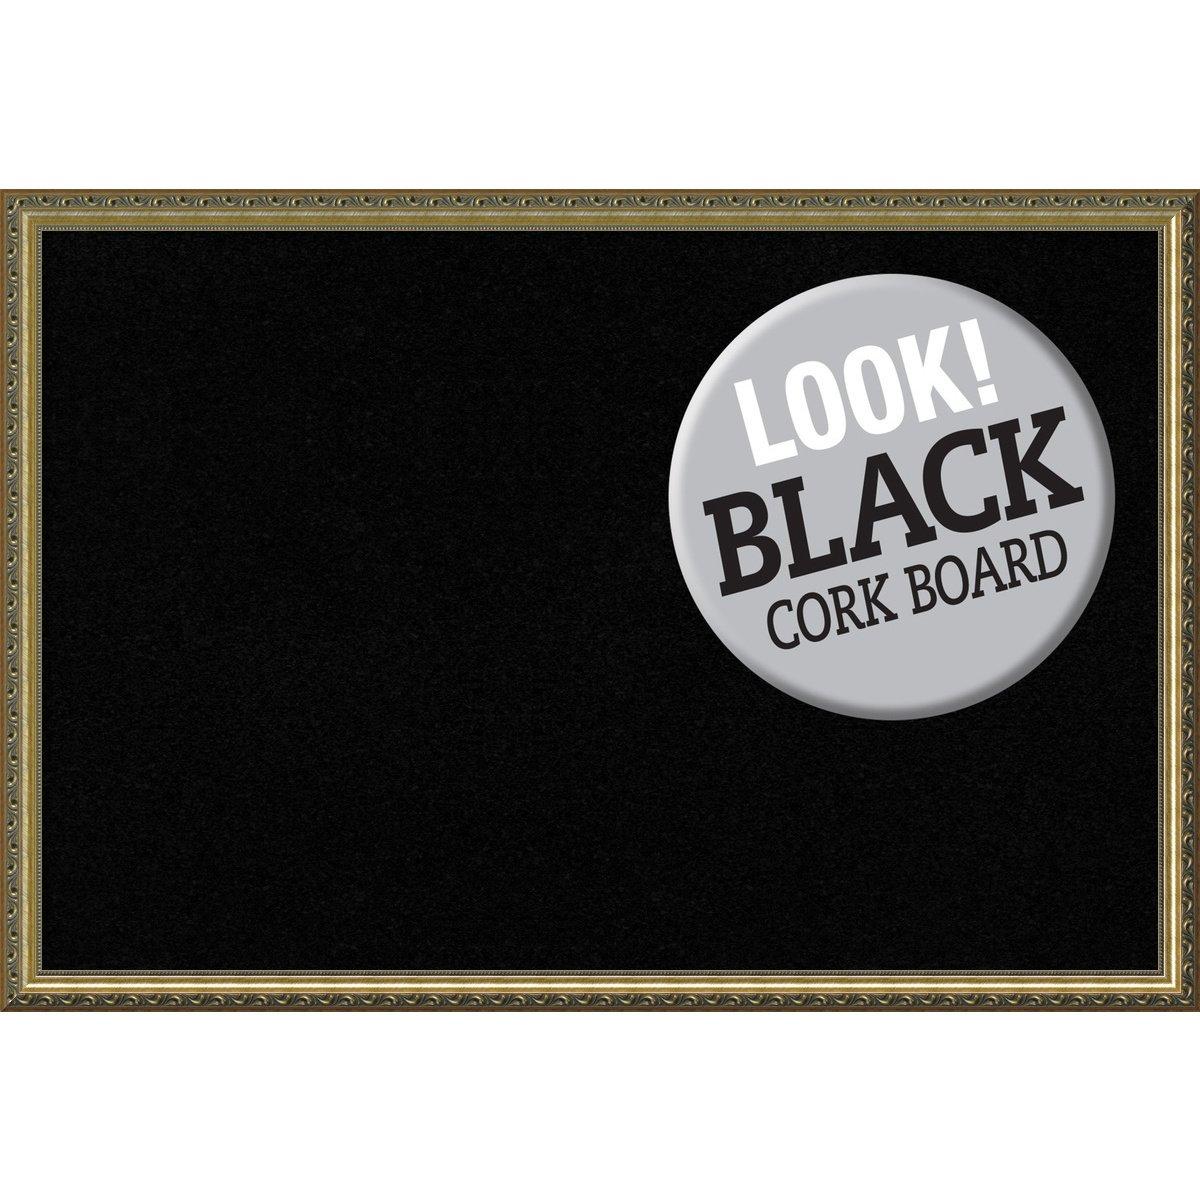 Amanti Art Framed Black Cork Board Parisian Bronze: Outer Size 38 x 26'' X-Lg, Extra Large